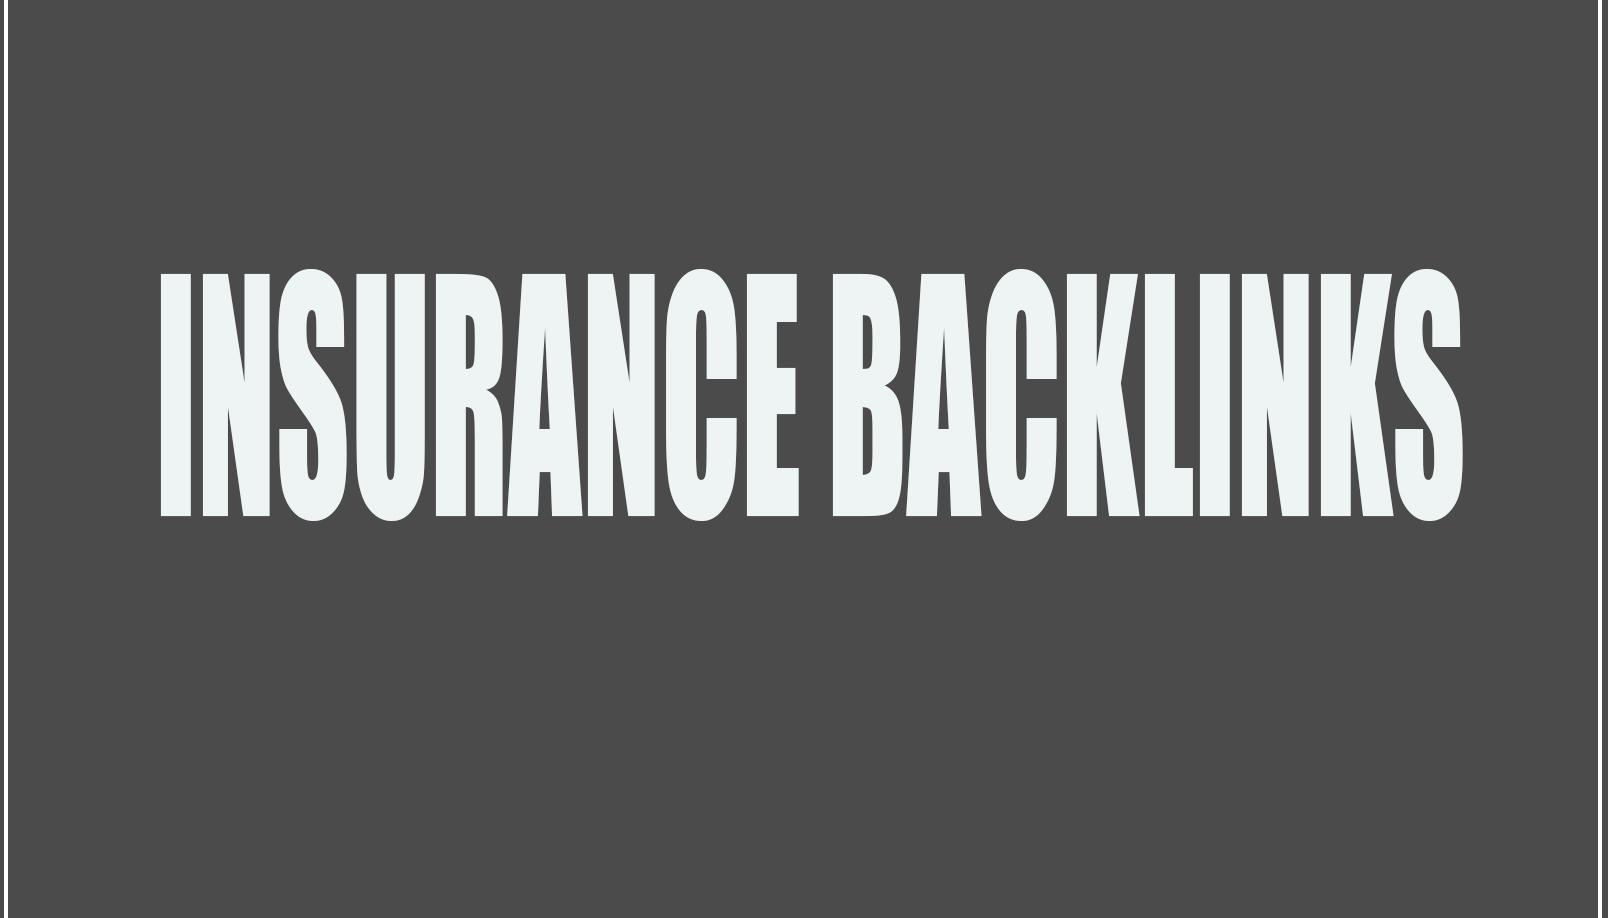 do DA 70 to 75 insurance site permanent dofollow backlinks for seo service